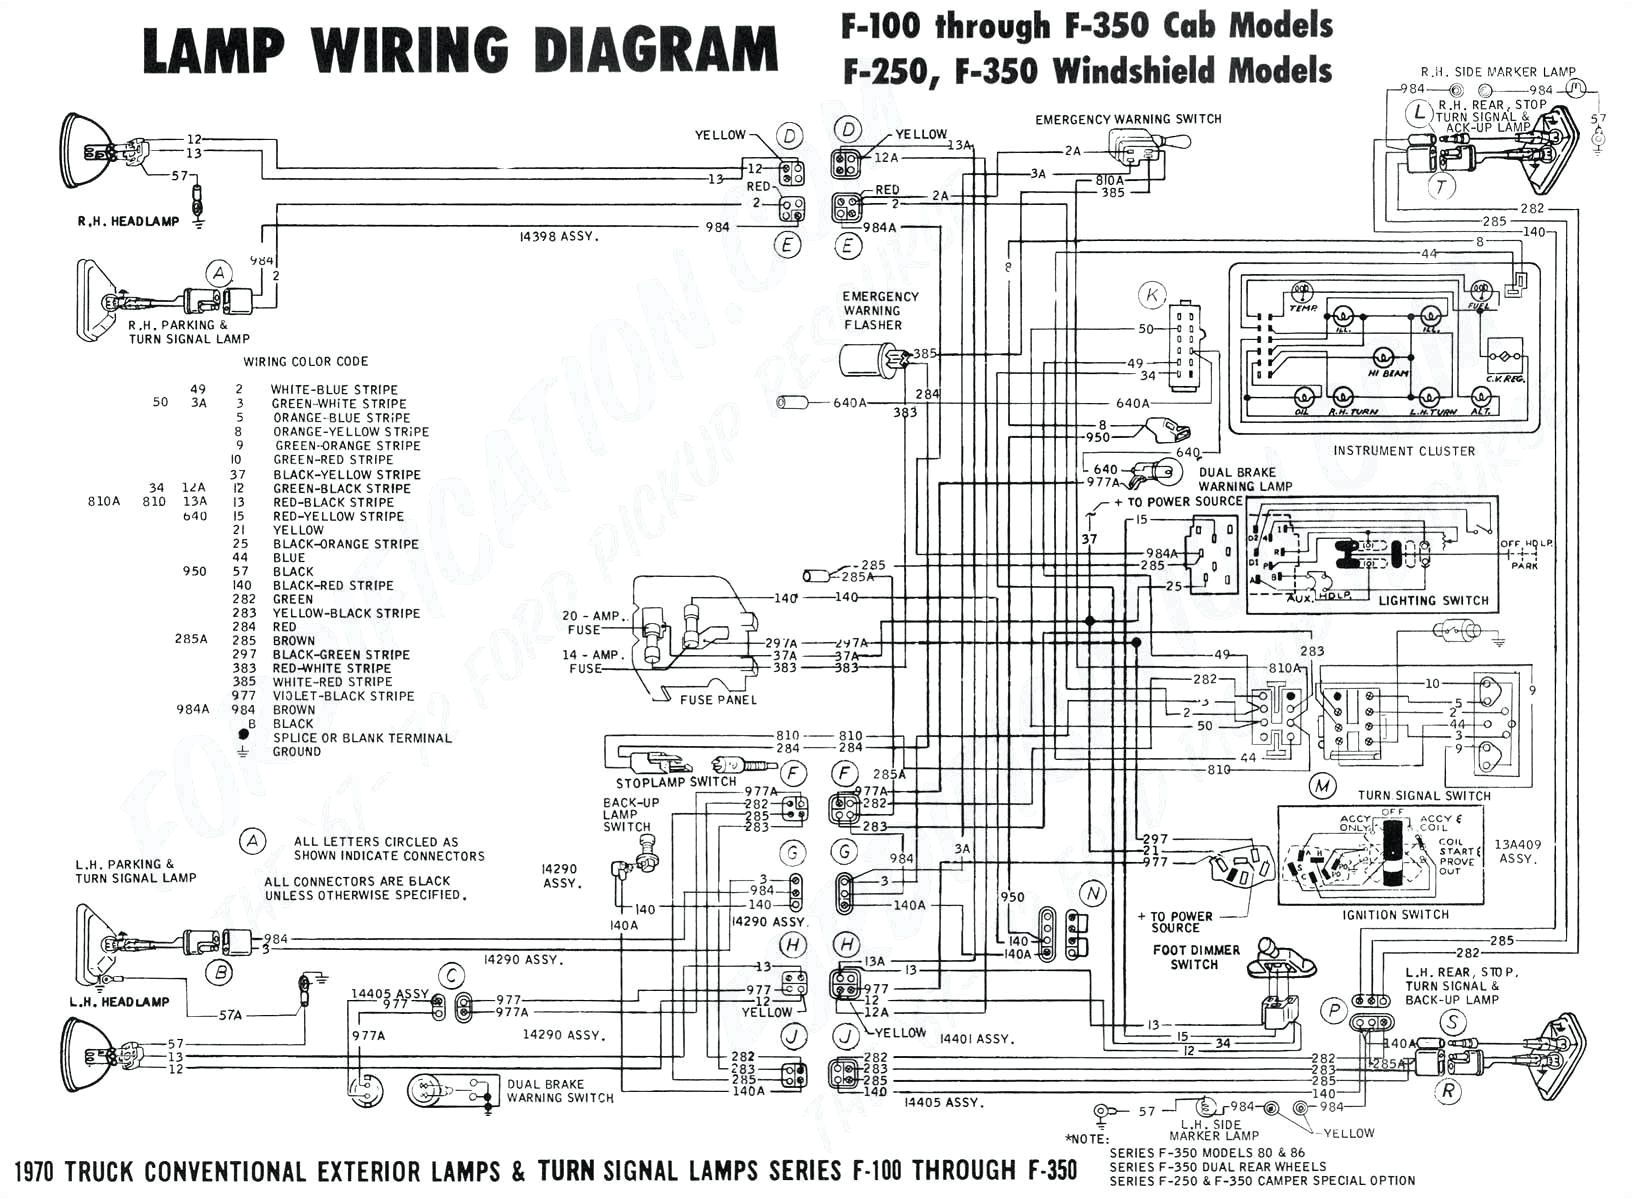 2004 nissan armada wiring diagram wiring diagram paper2004 nissan titan wiring diagram wiring diagram technic 2004